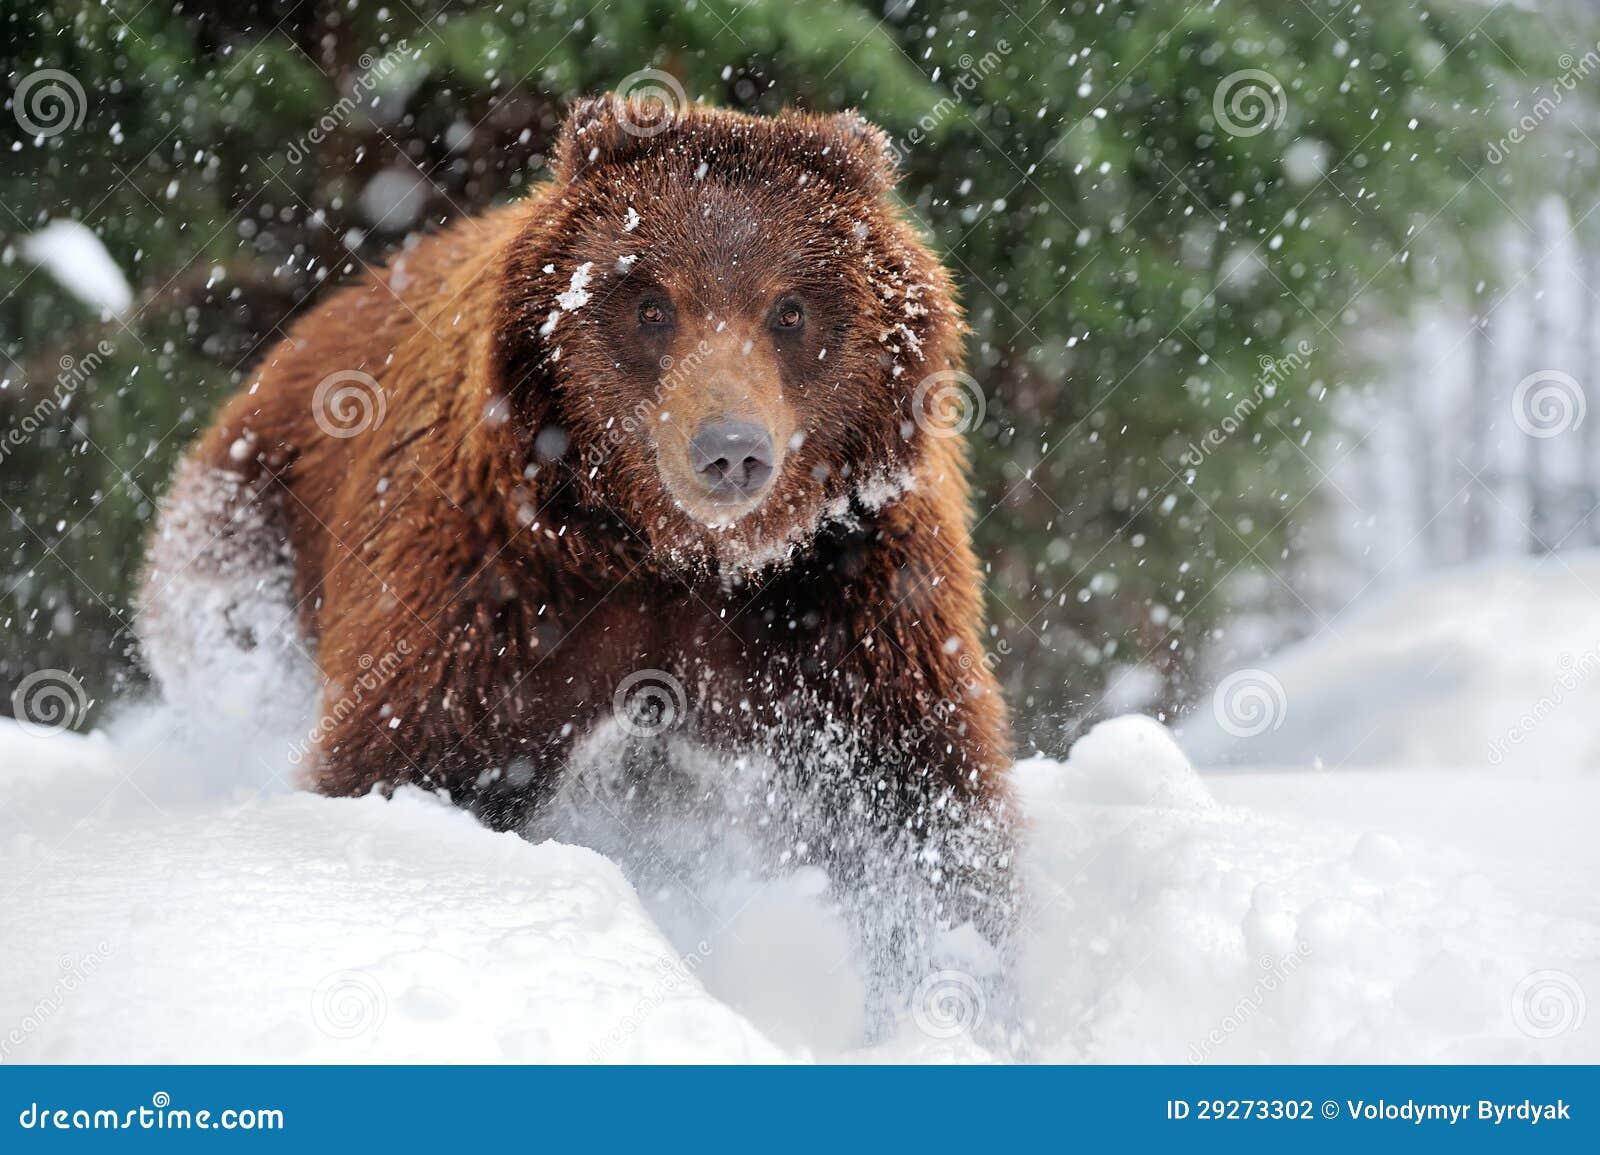 熊乃瑺yak9�+�,_mr: no pr: no 0 290 0 熊 id 29273302 © volodymyr byrdyak